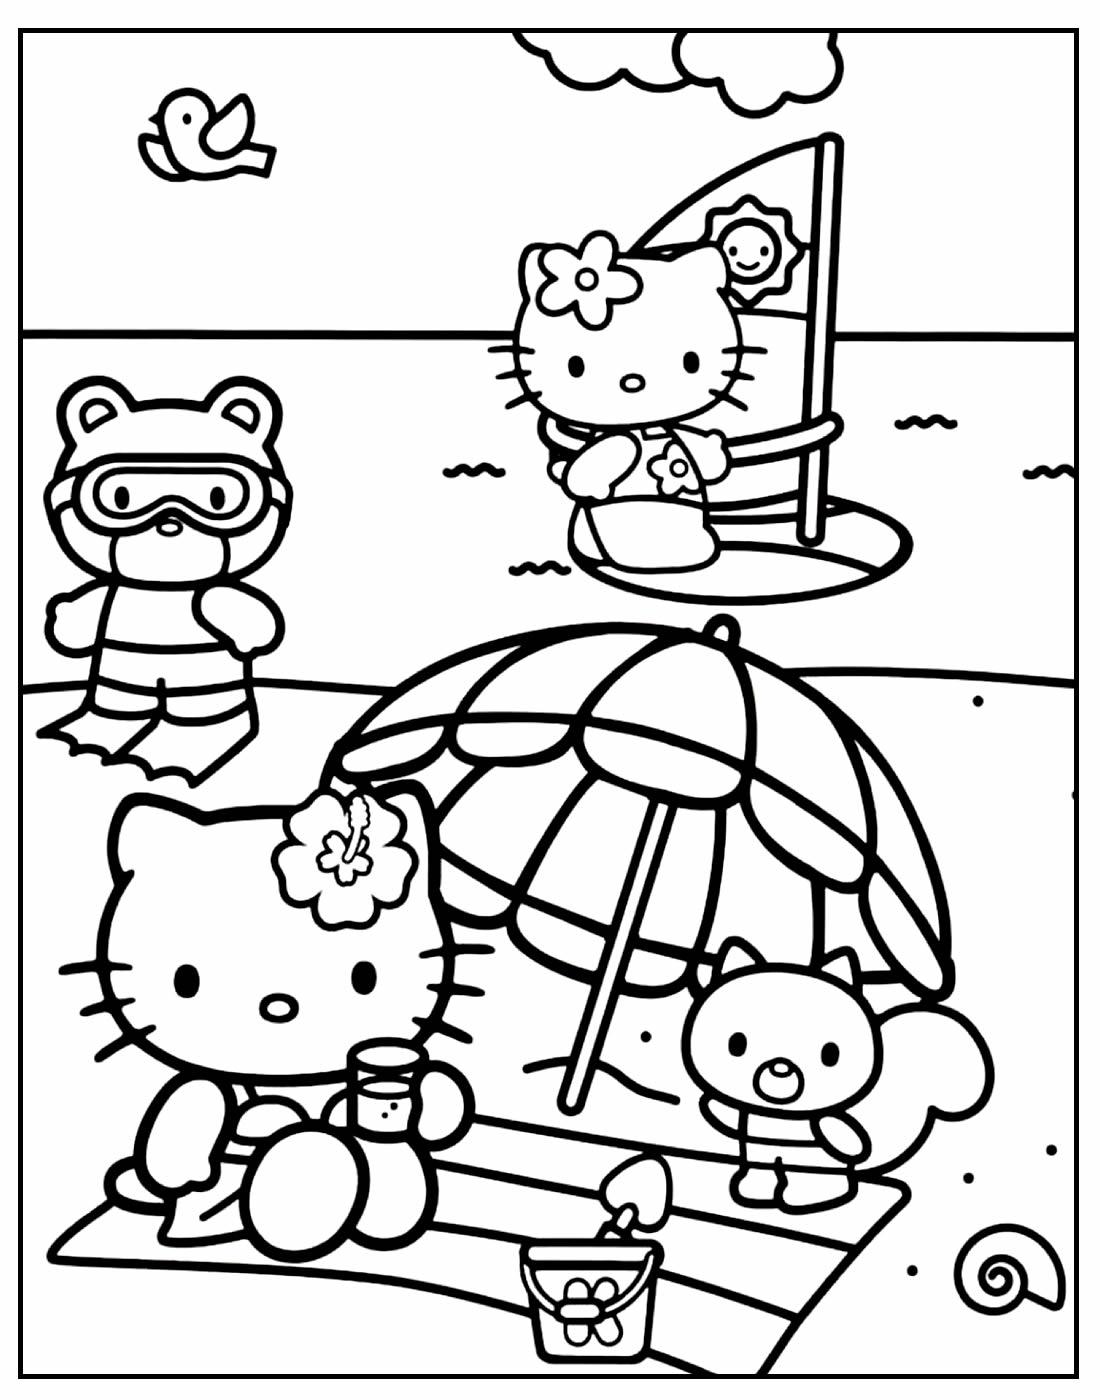 Página para colorir da Hello Kitty